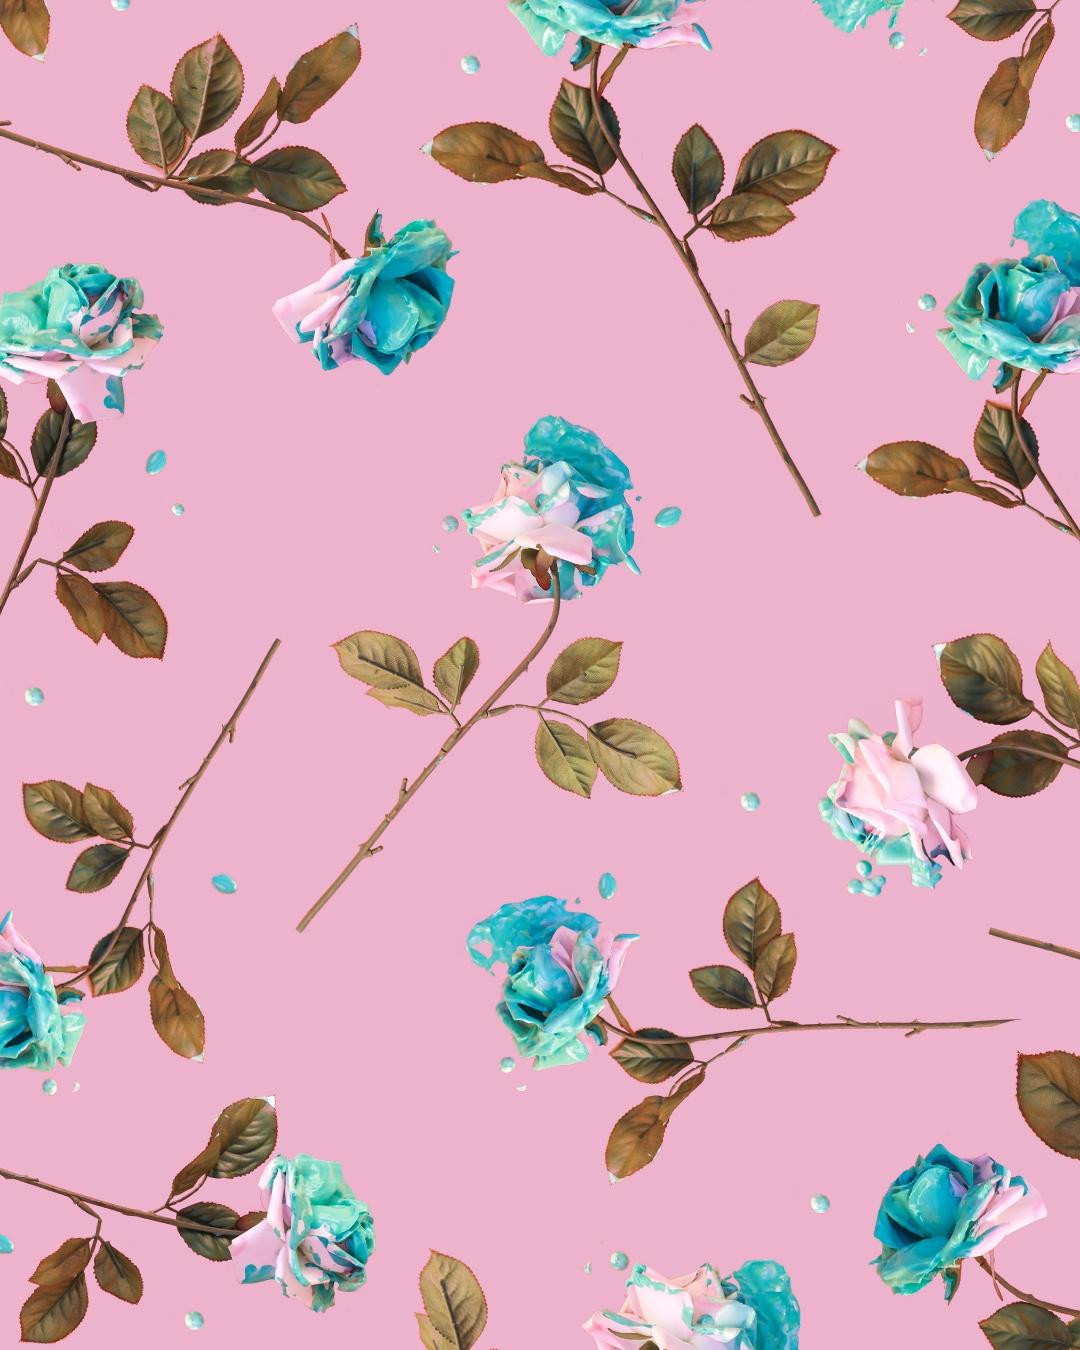 Happy Loves Day! Rosey Posey Bl - elisemesner | ello